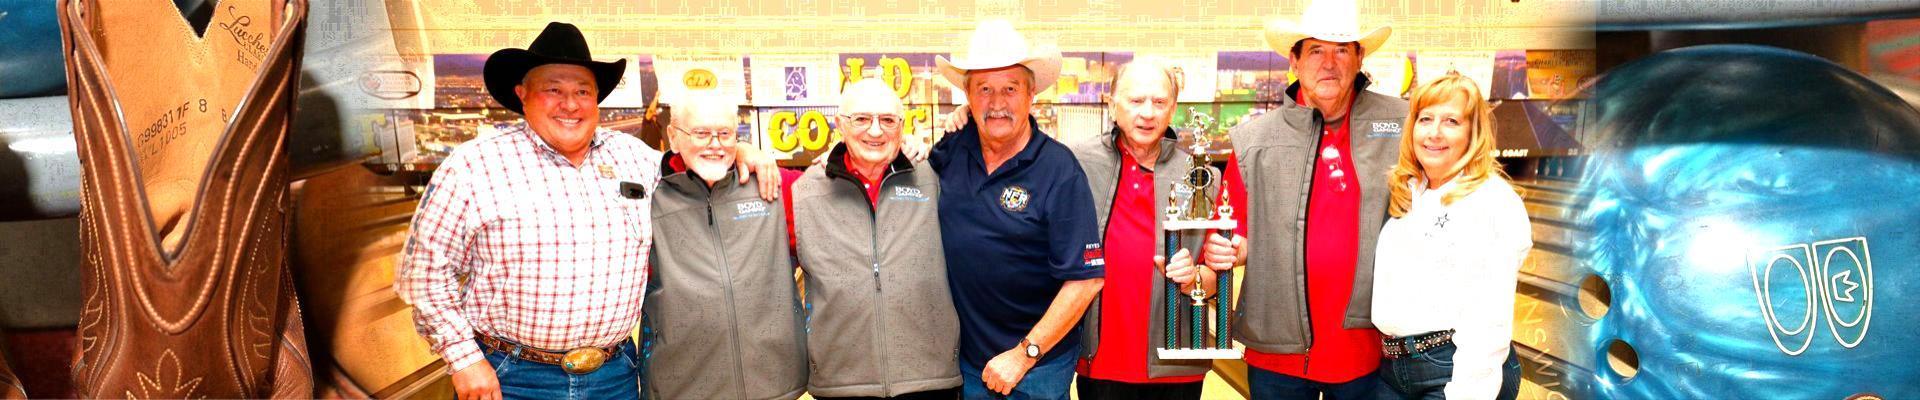 Bob Tallman WNFR Charity Bowling Tournament Header